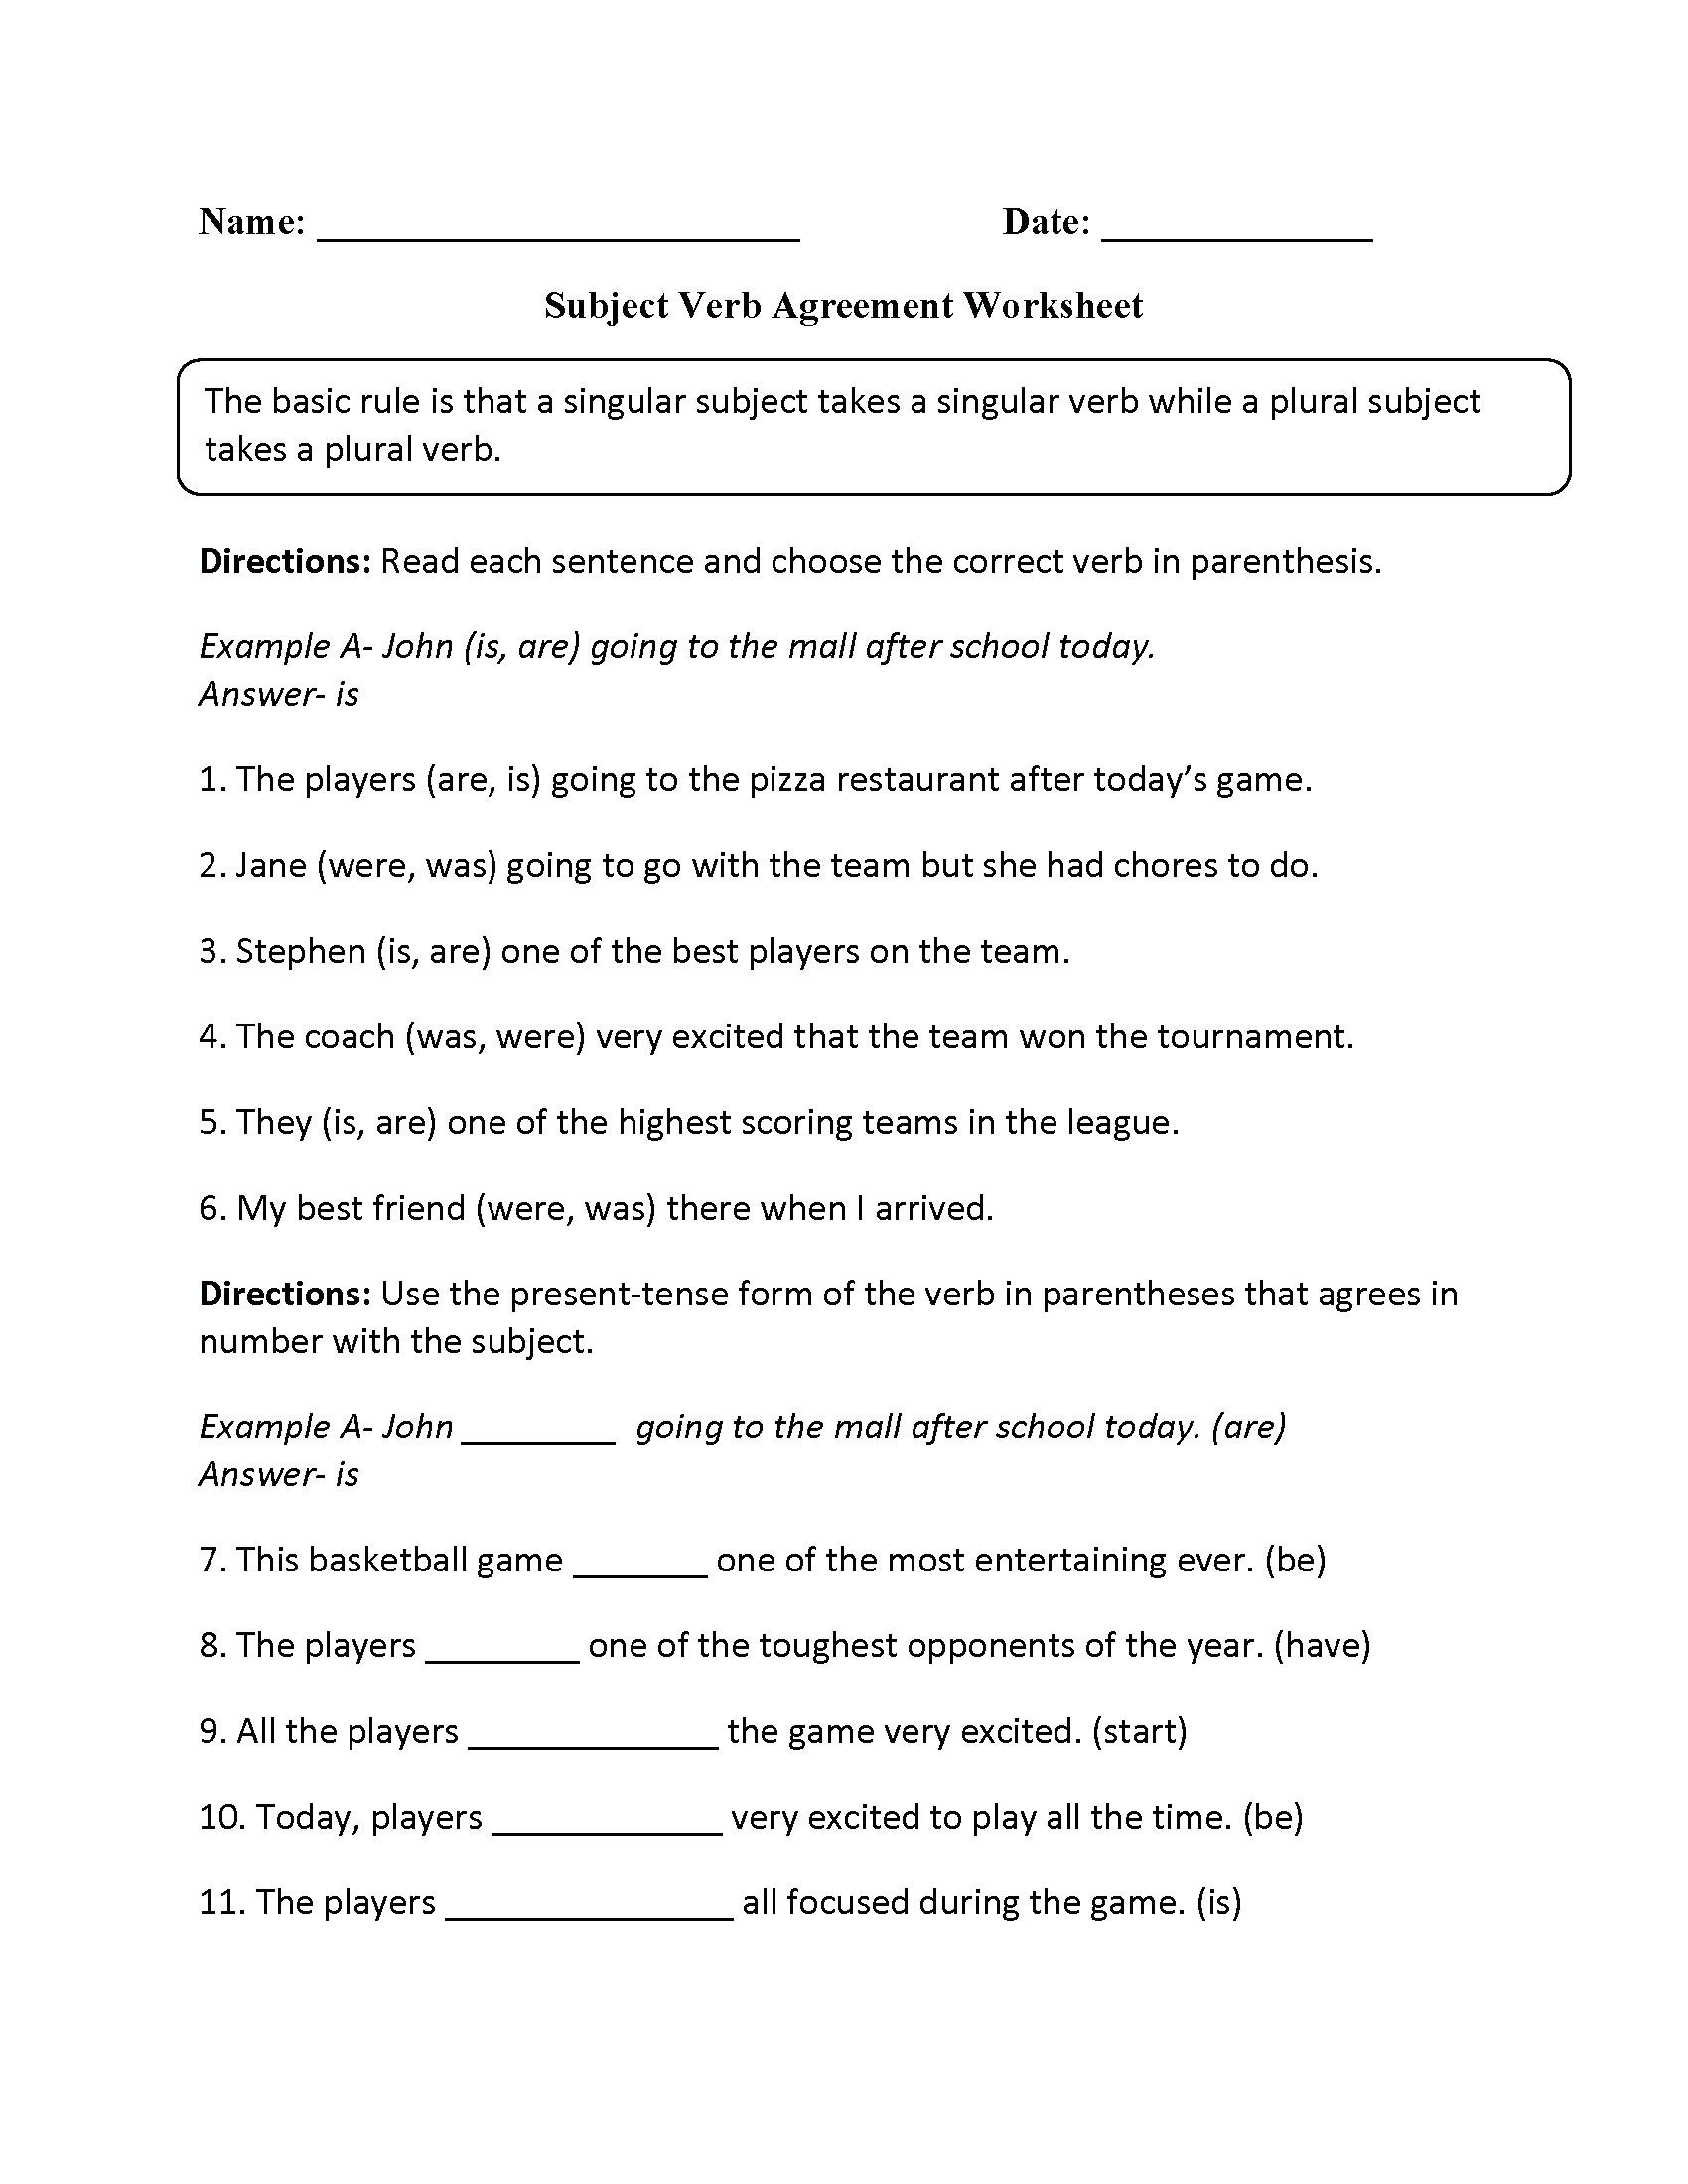 Third Grade Grammar Worksheets 6 Grammar Worksheets 3rd Grade Pdf Worksheets